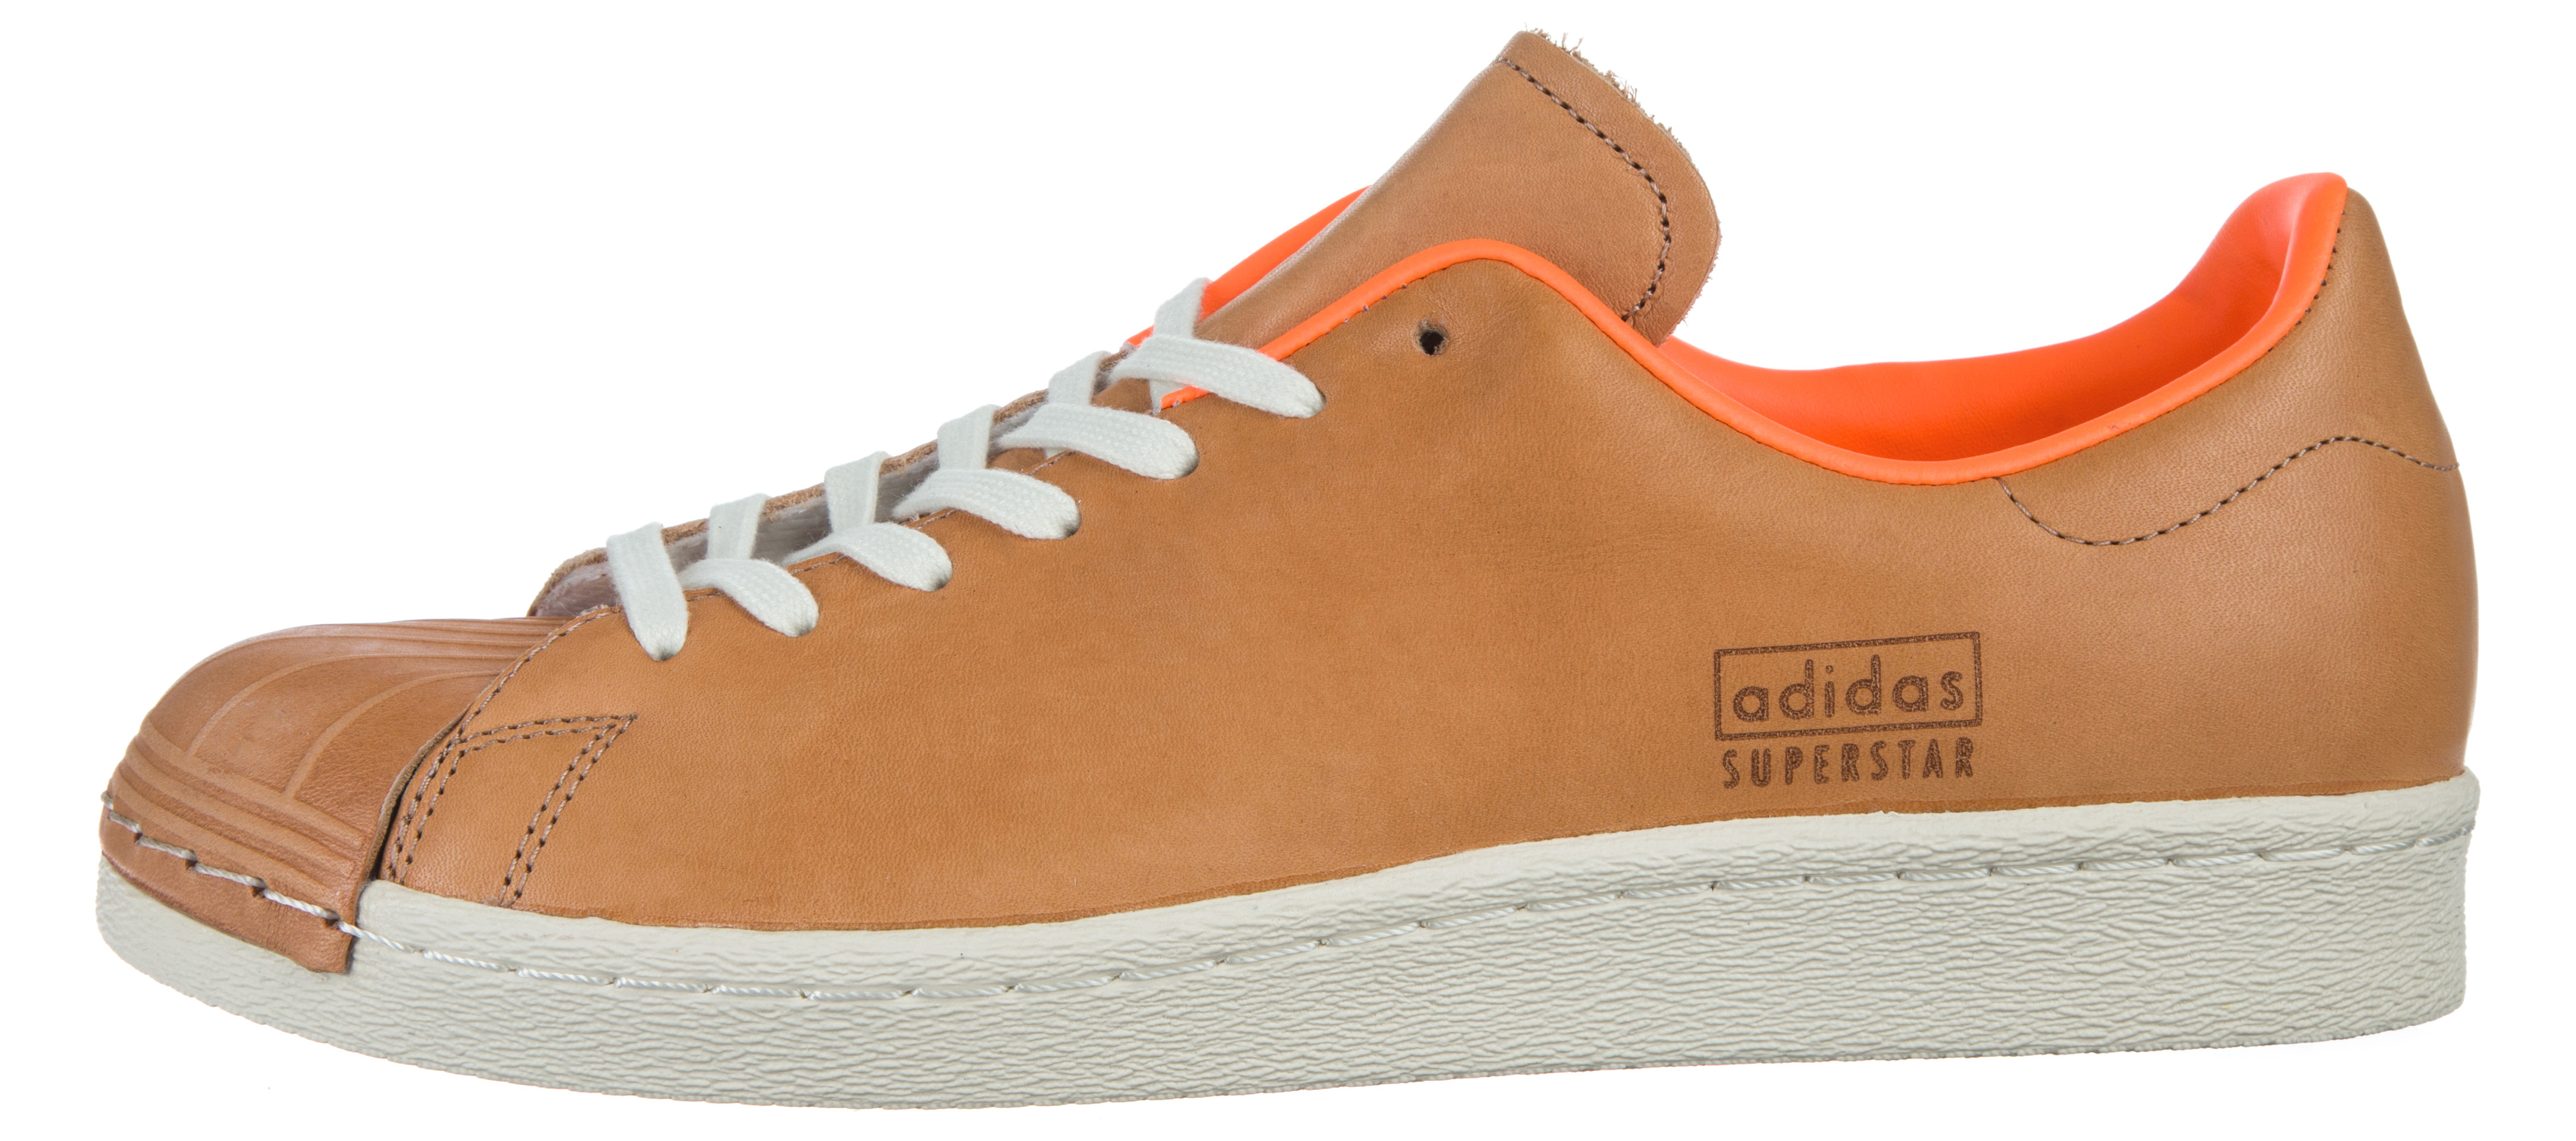 brand new 2c65c 9a6ee adidas Originals Superstar 80's Clean Sneakers BA7767 Rjava ...